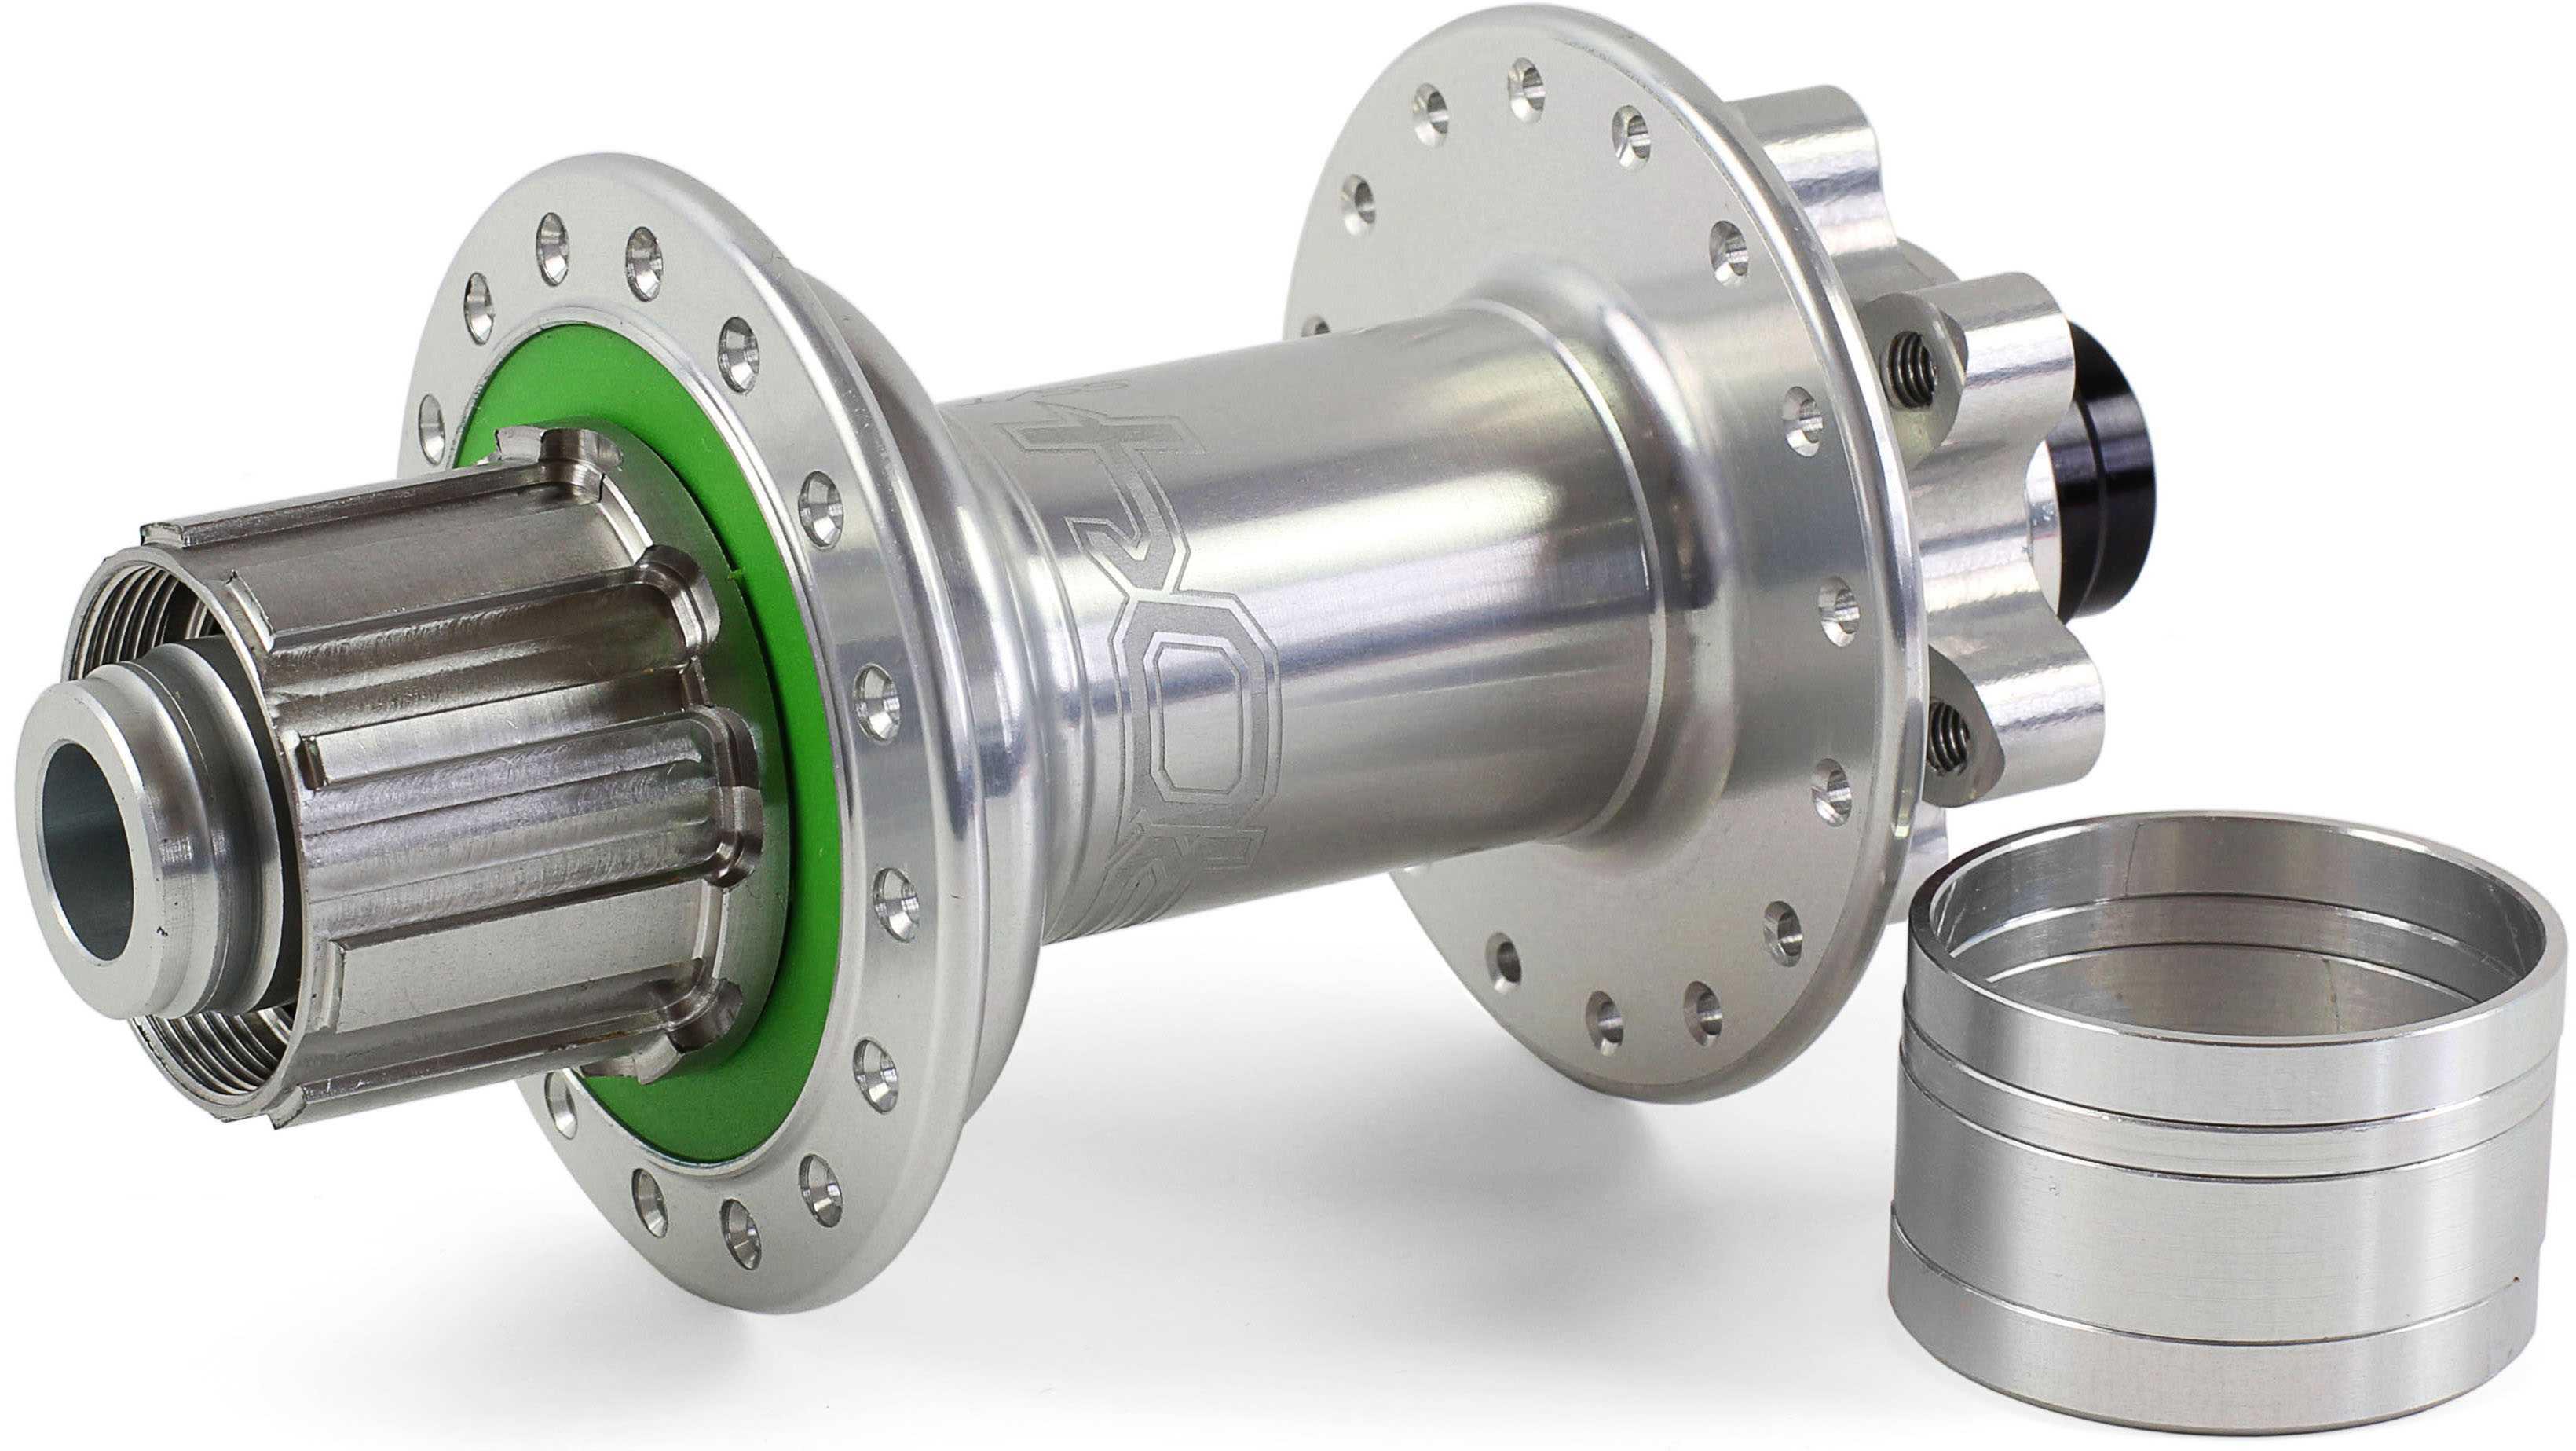 Bagnav Hope Pro 4 Trial/Single Speed IS 32H 12 x 135 mm Shimano/SRAM stål silver | Hubs